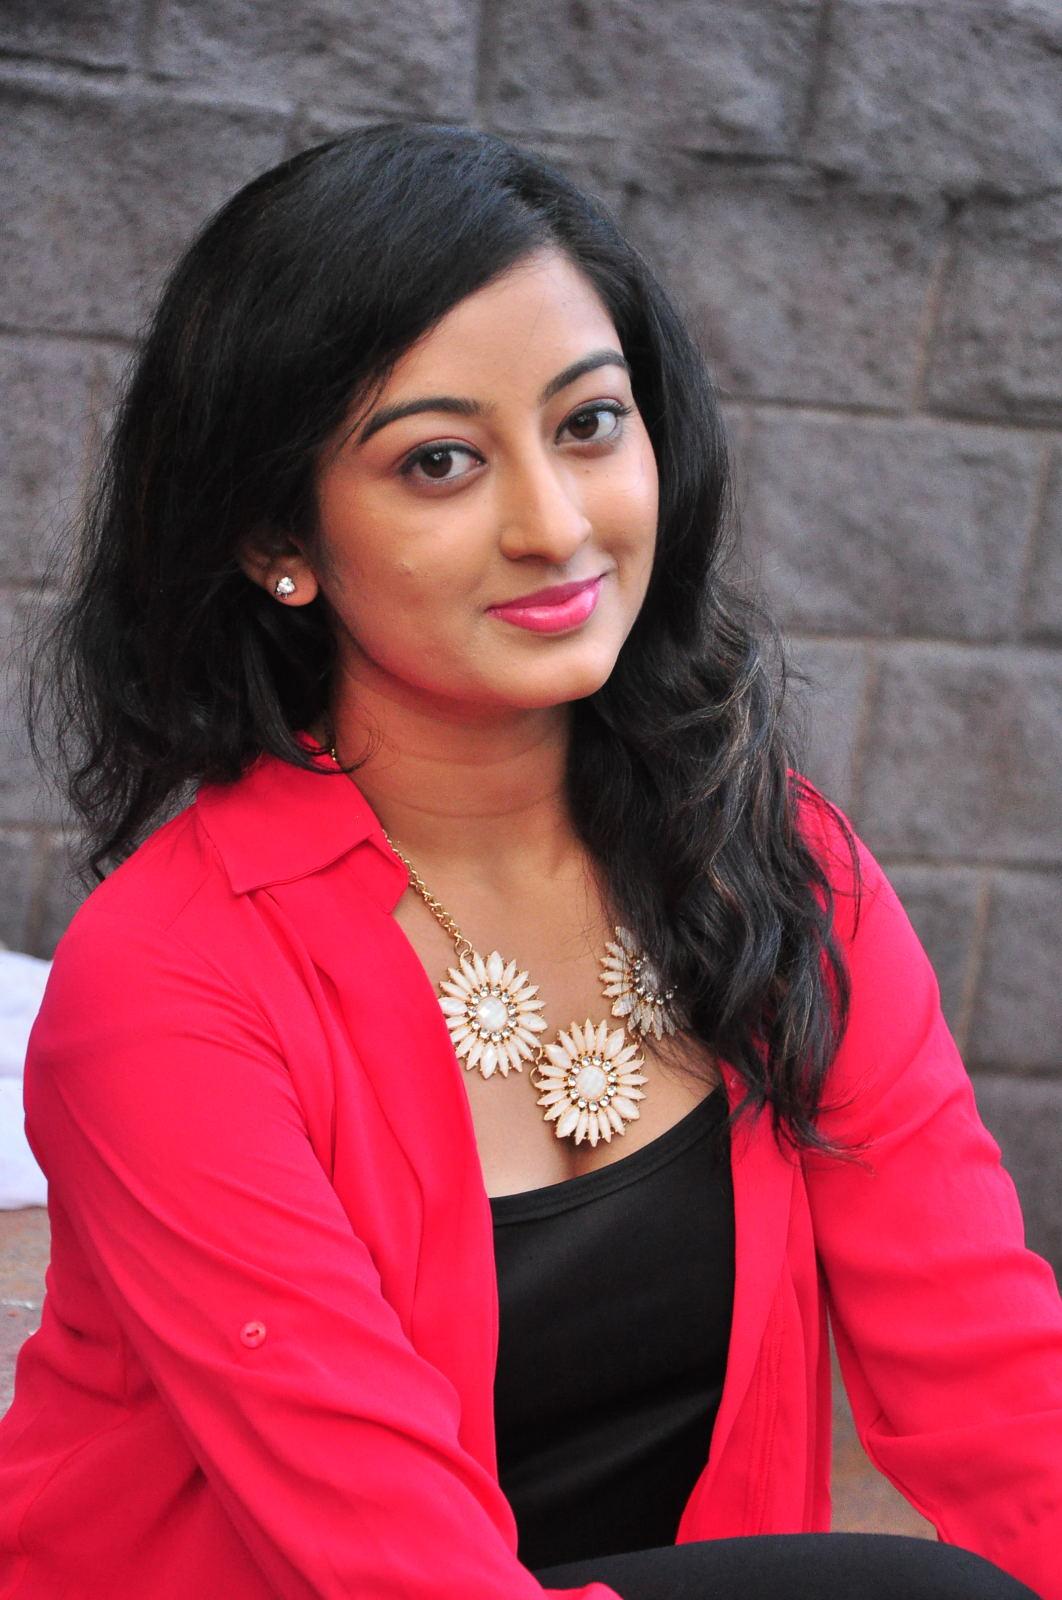 Rishika Glamorous Photos At Billa Ranga Press Meet - HD